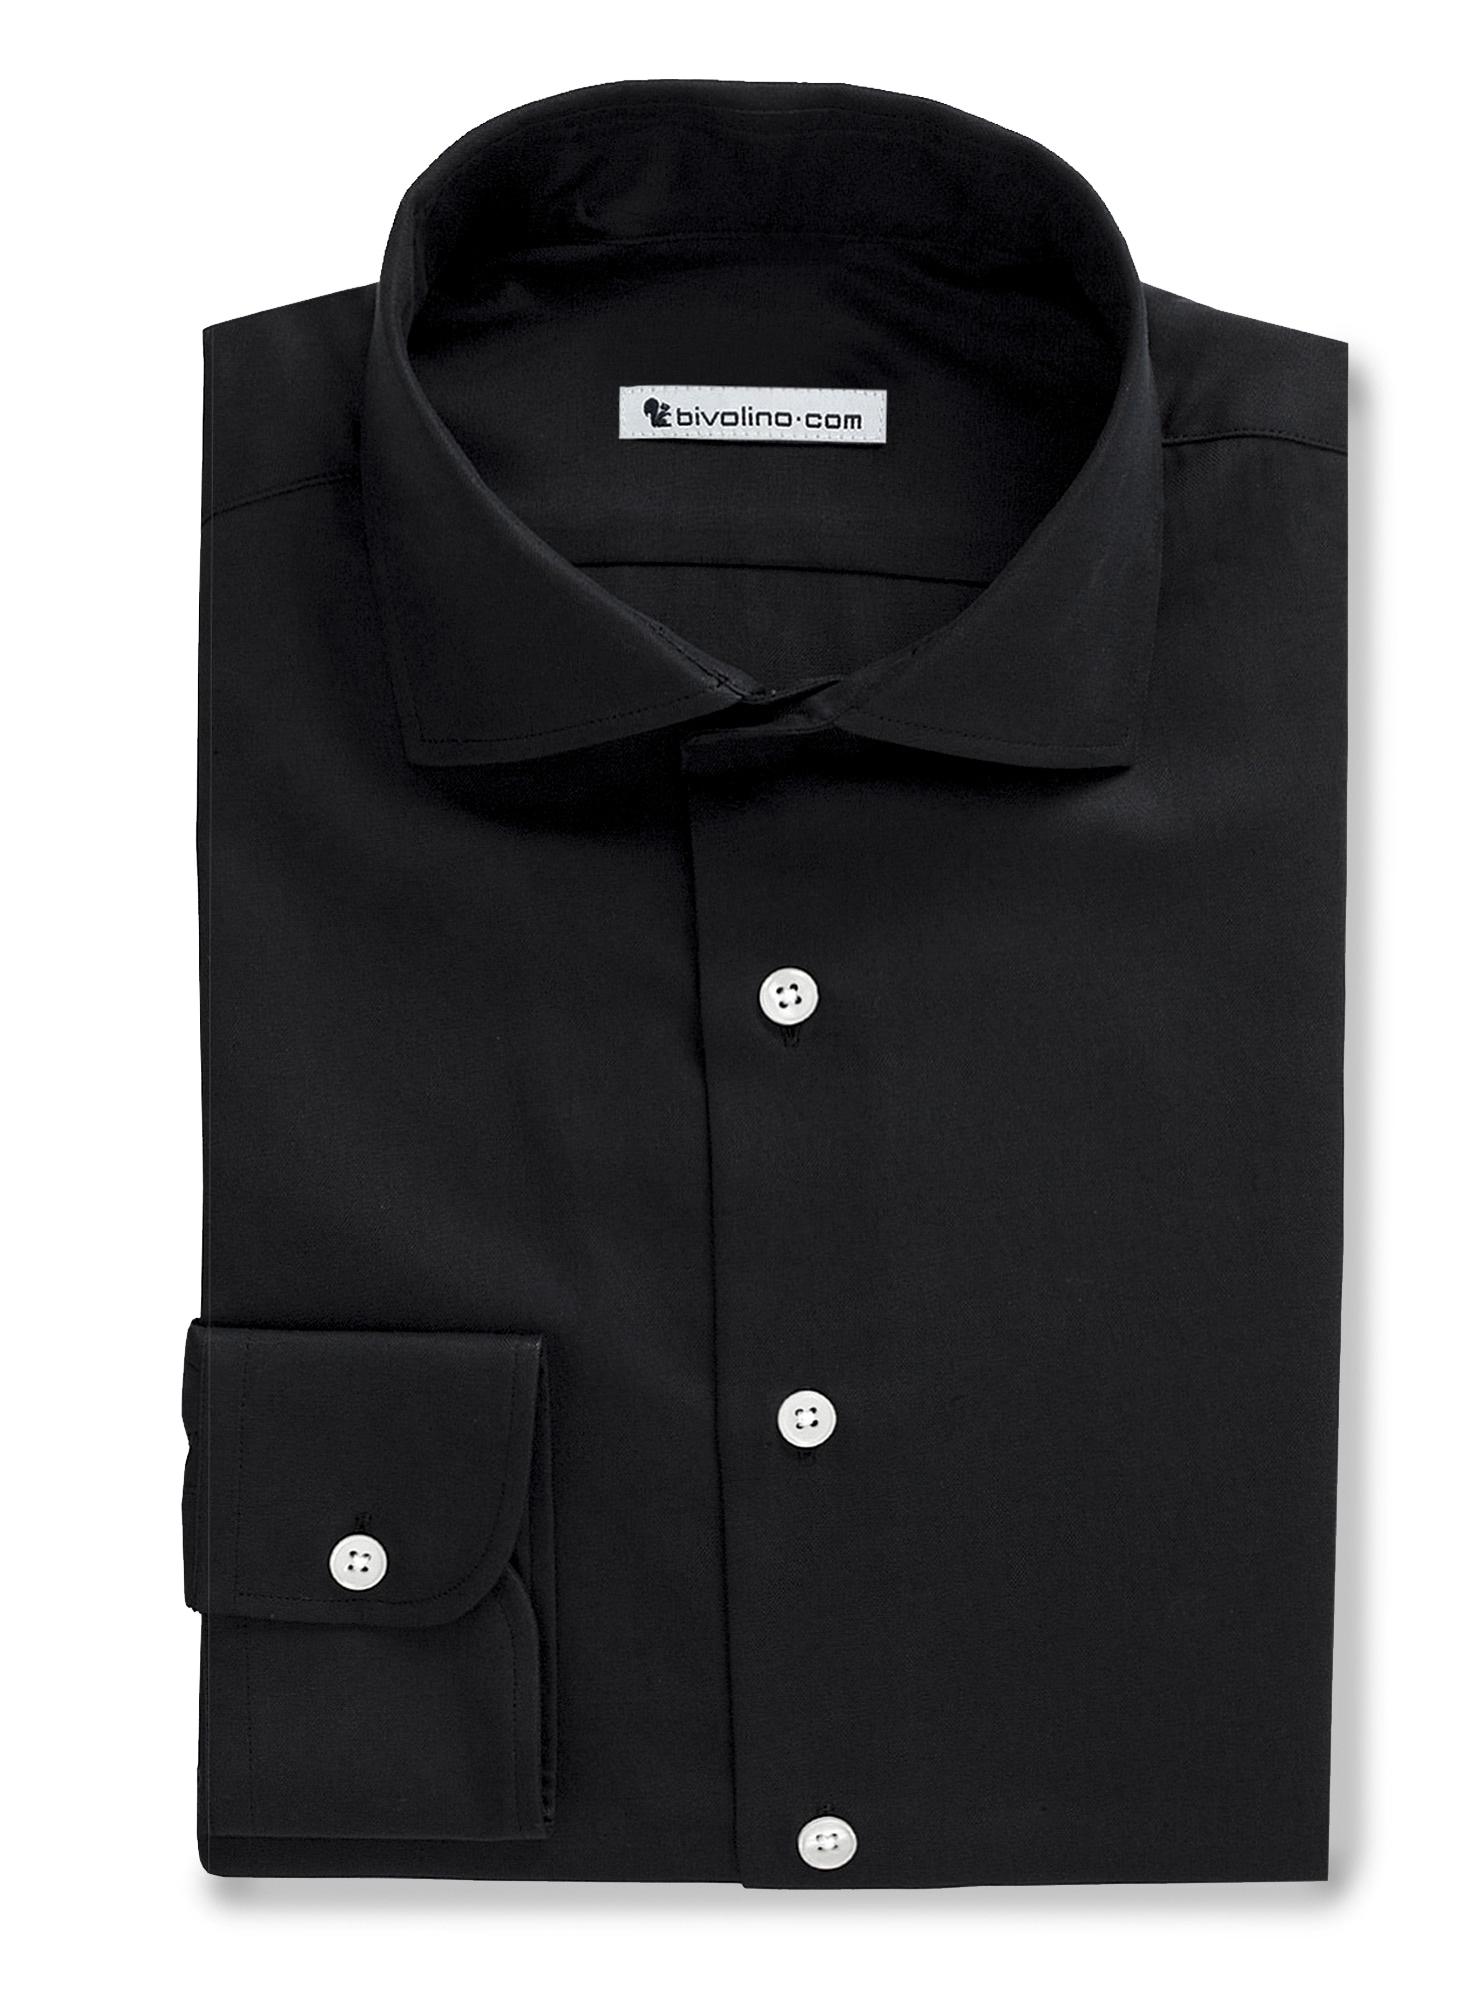 ROLO - zwart popeline overhemd - Dana 4